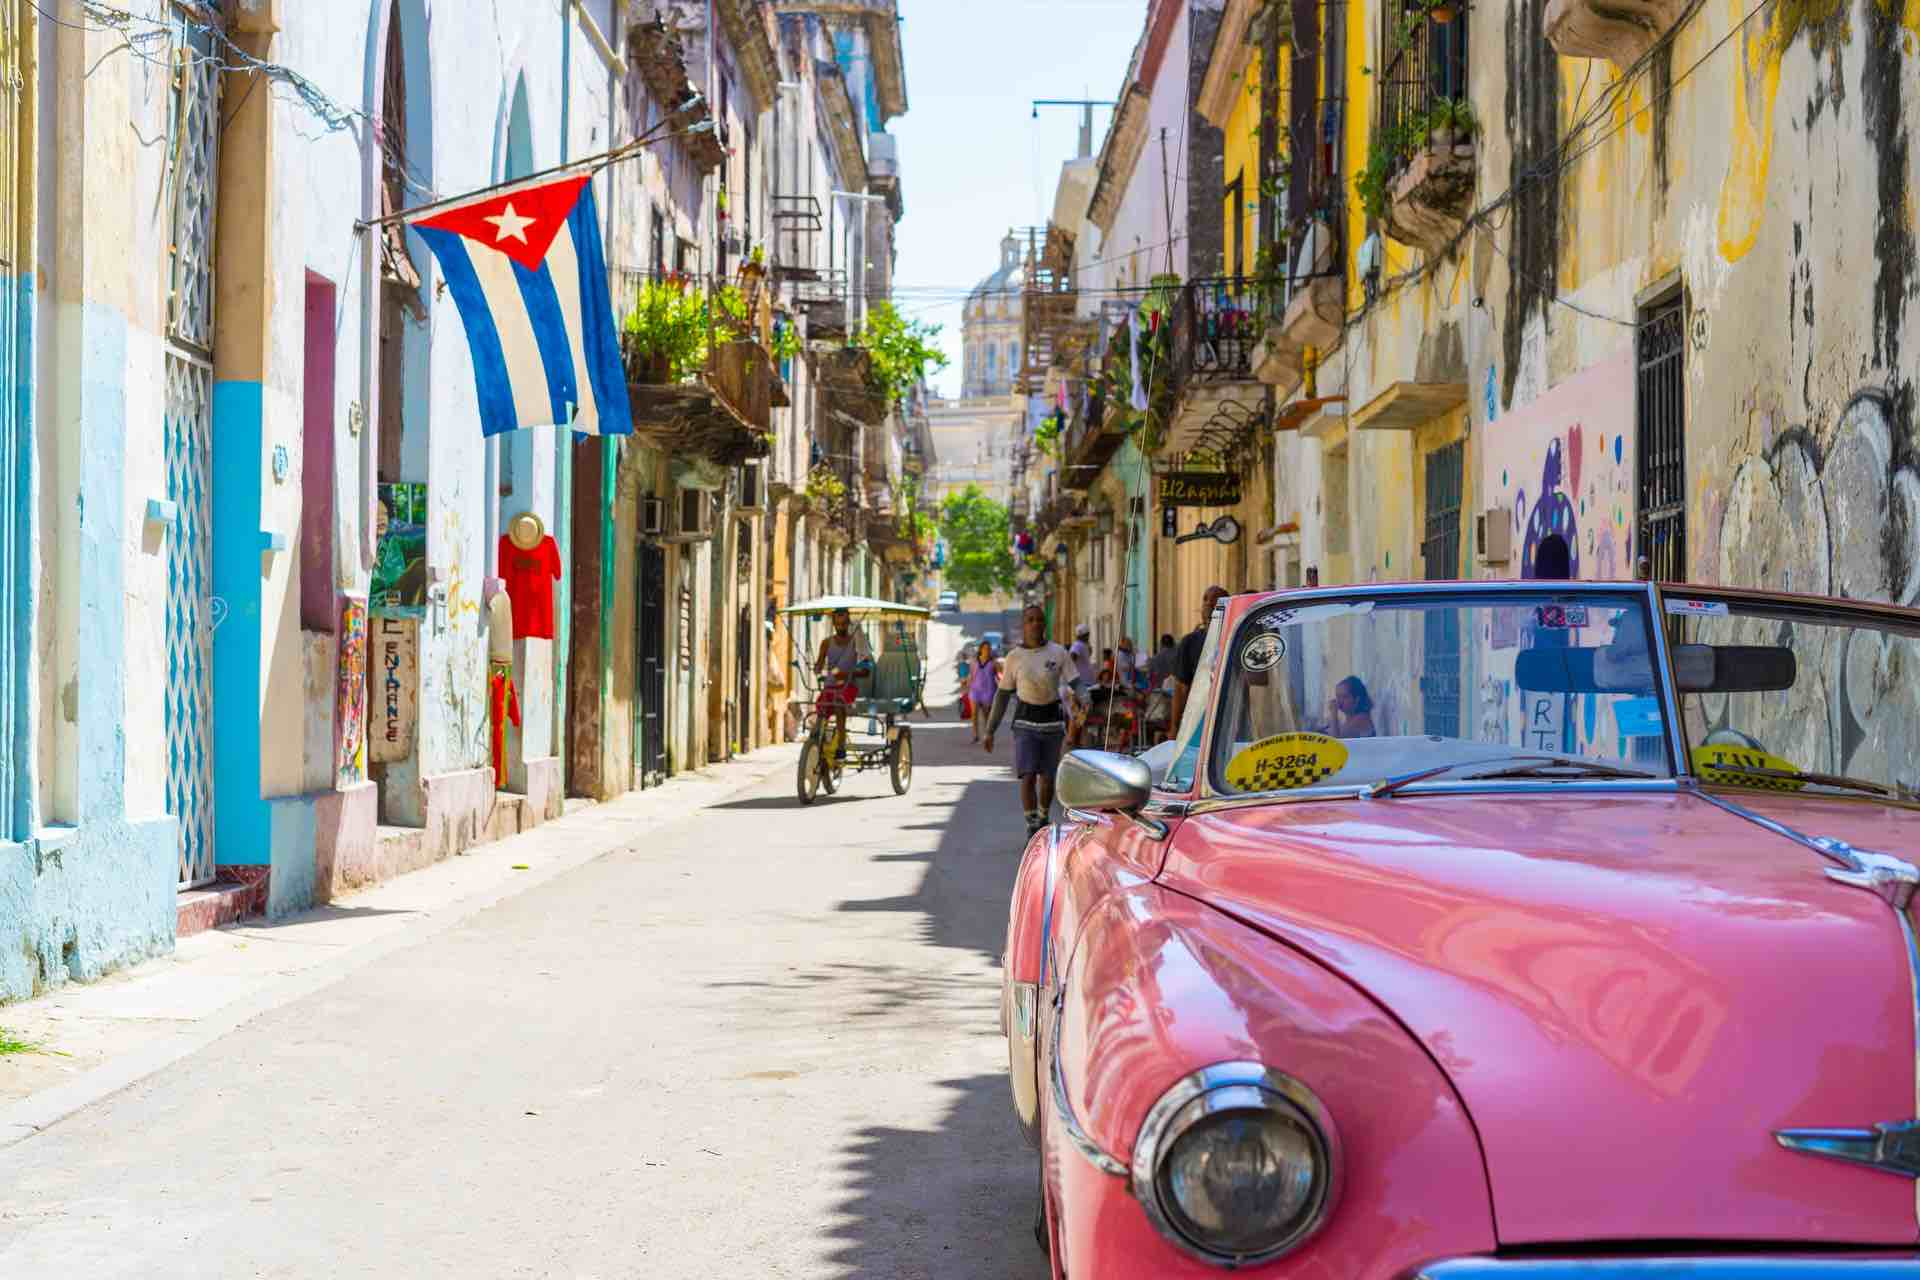 Cuba remesas